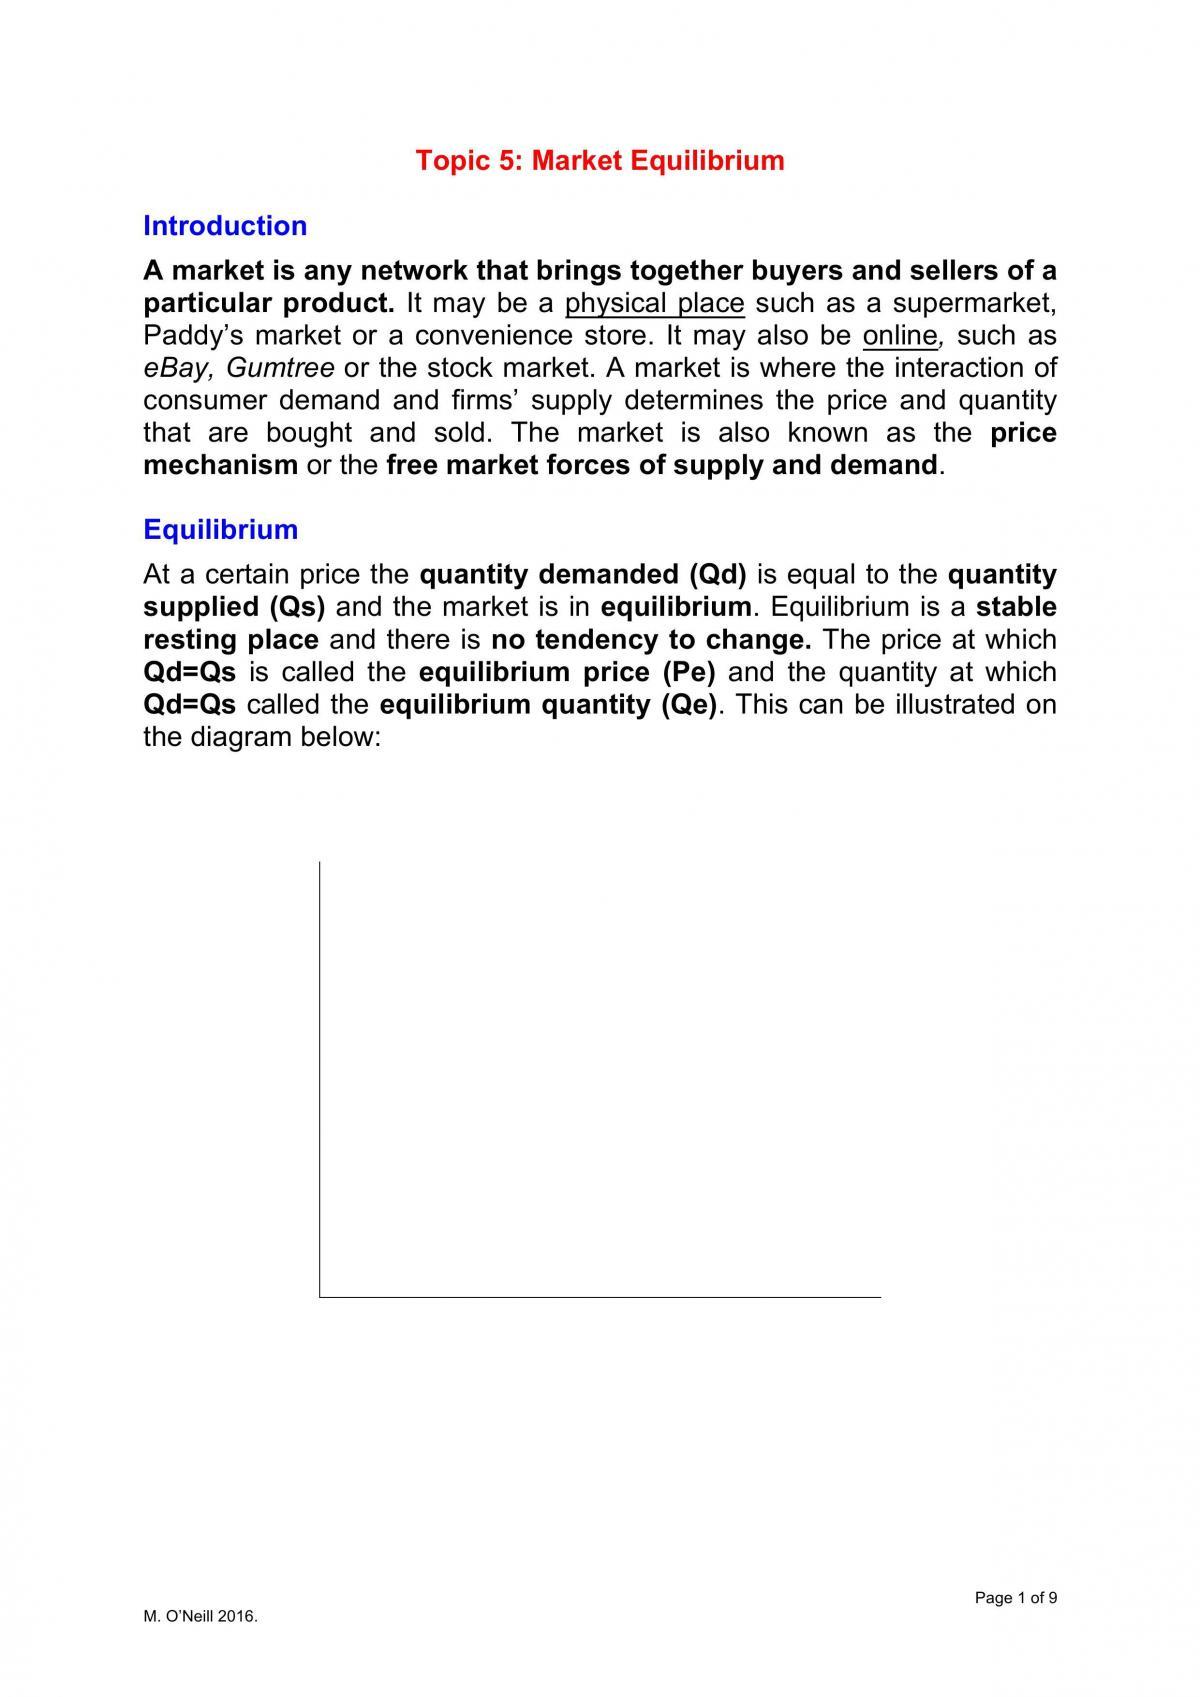 Topic 5 - Equilibrium - Page 1